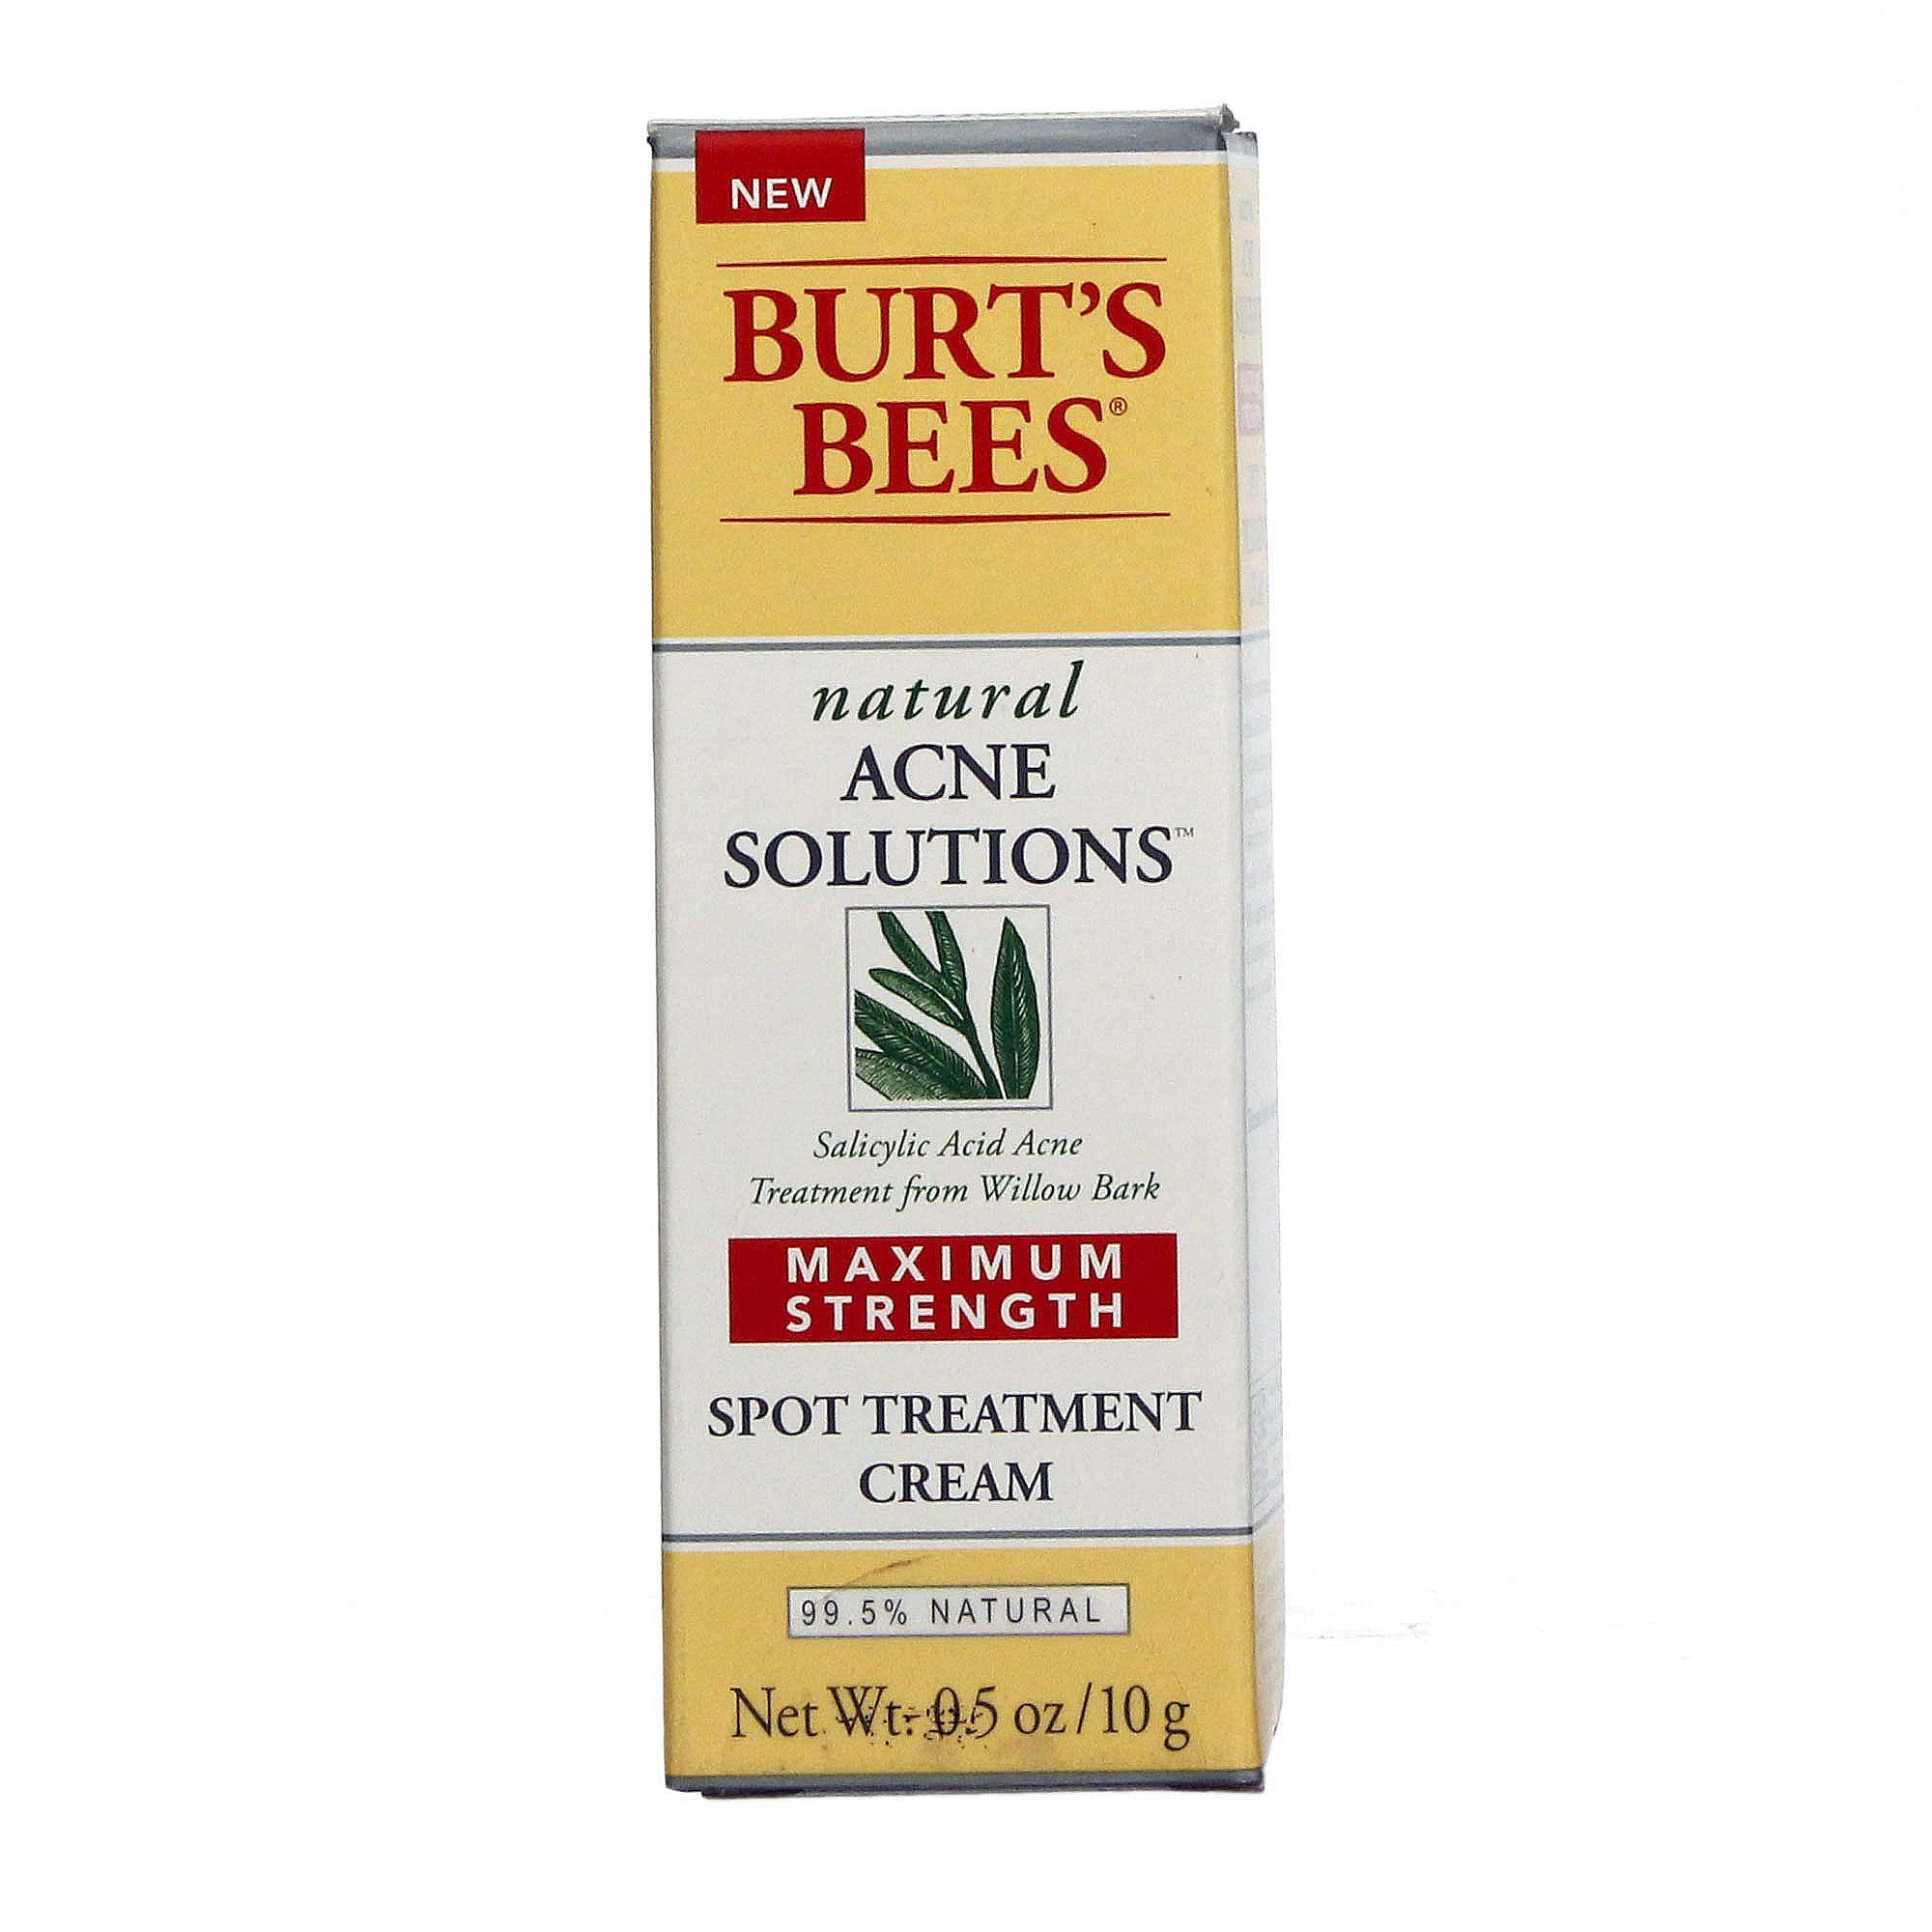 Buy Burt's Bees Natural Acne Solutions Maximum Strength Spot Treatment Cream - 0.5 oz Hong Kong